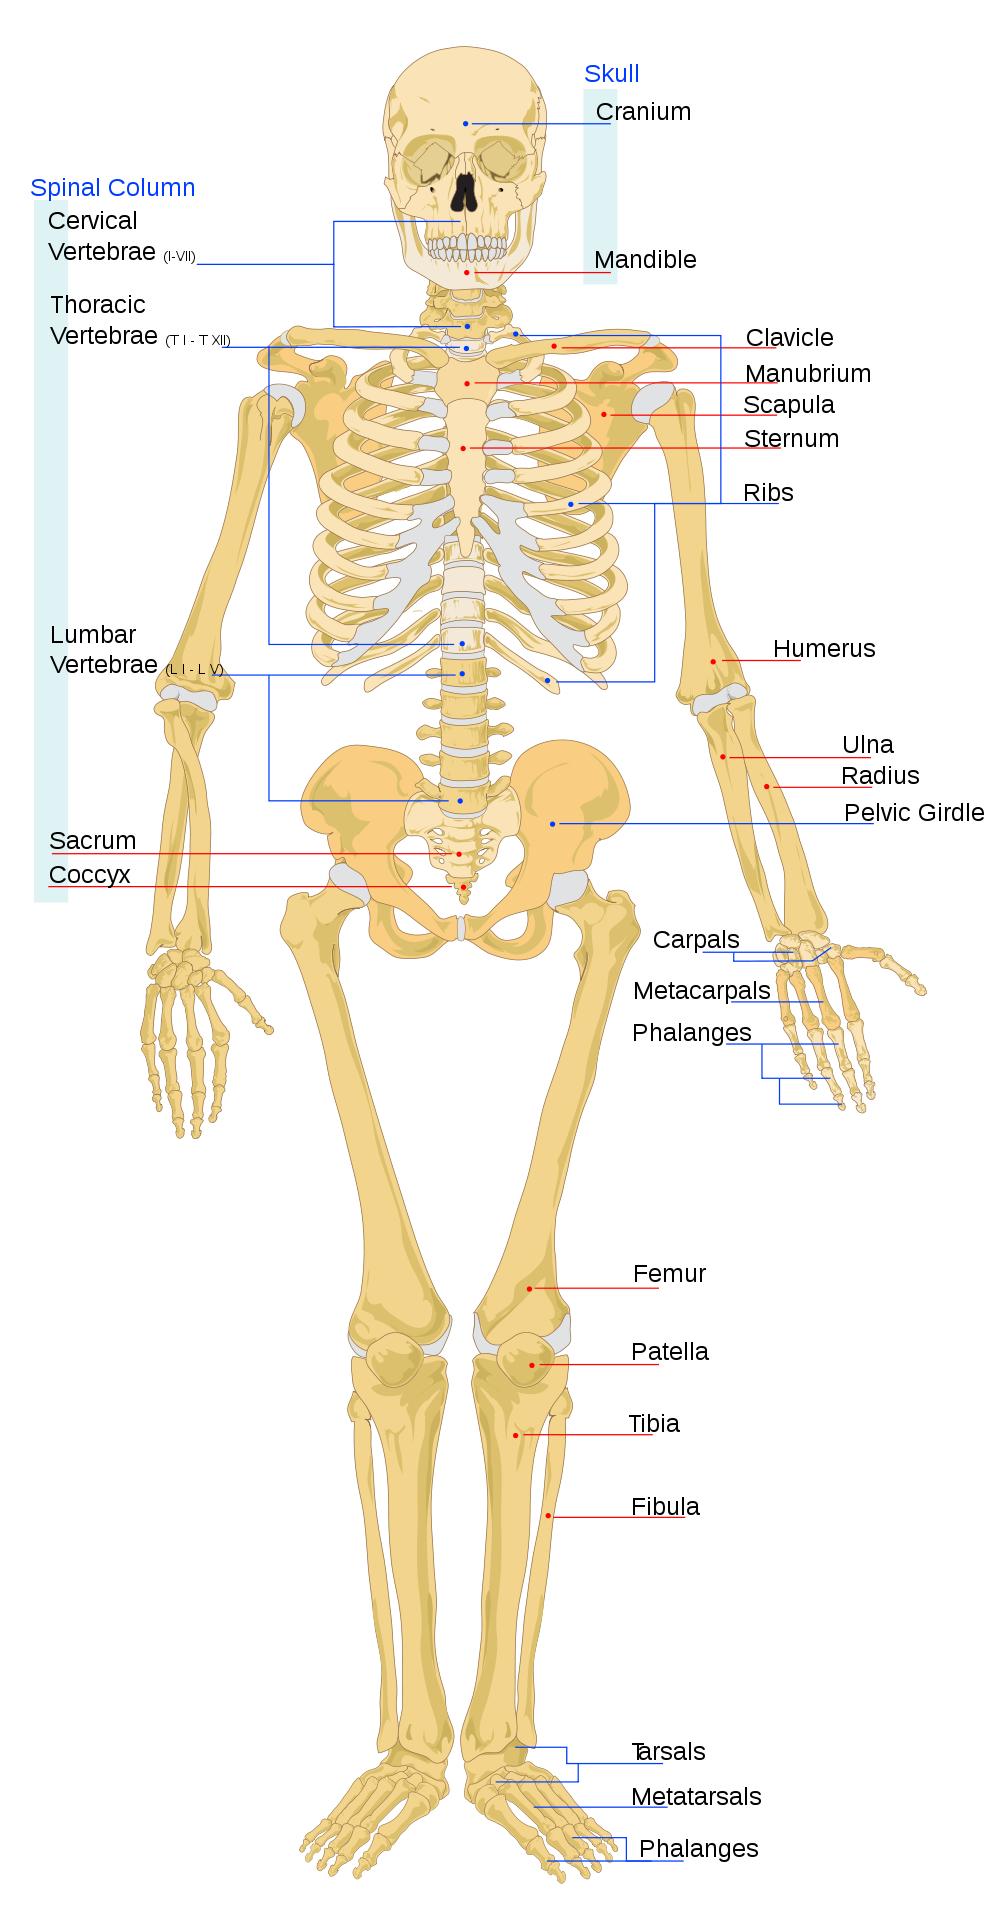 Human Skeletal System Human Skeleton Bones And Functions Of